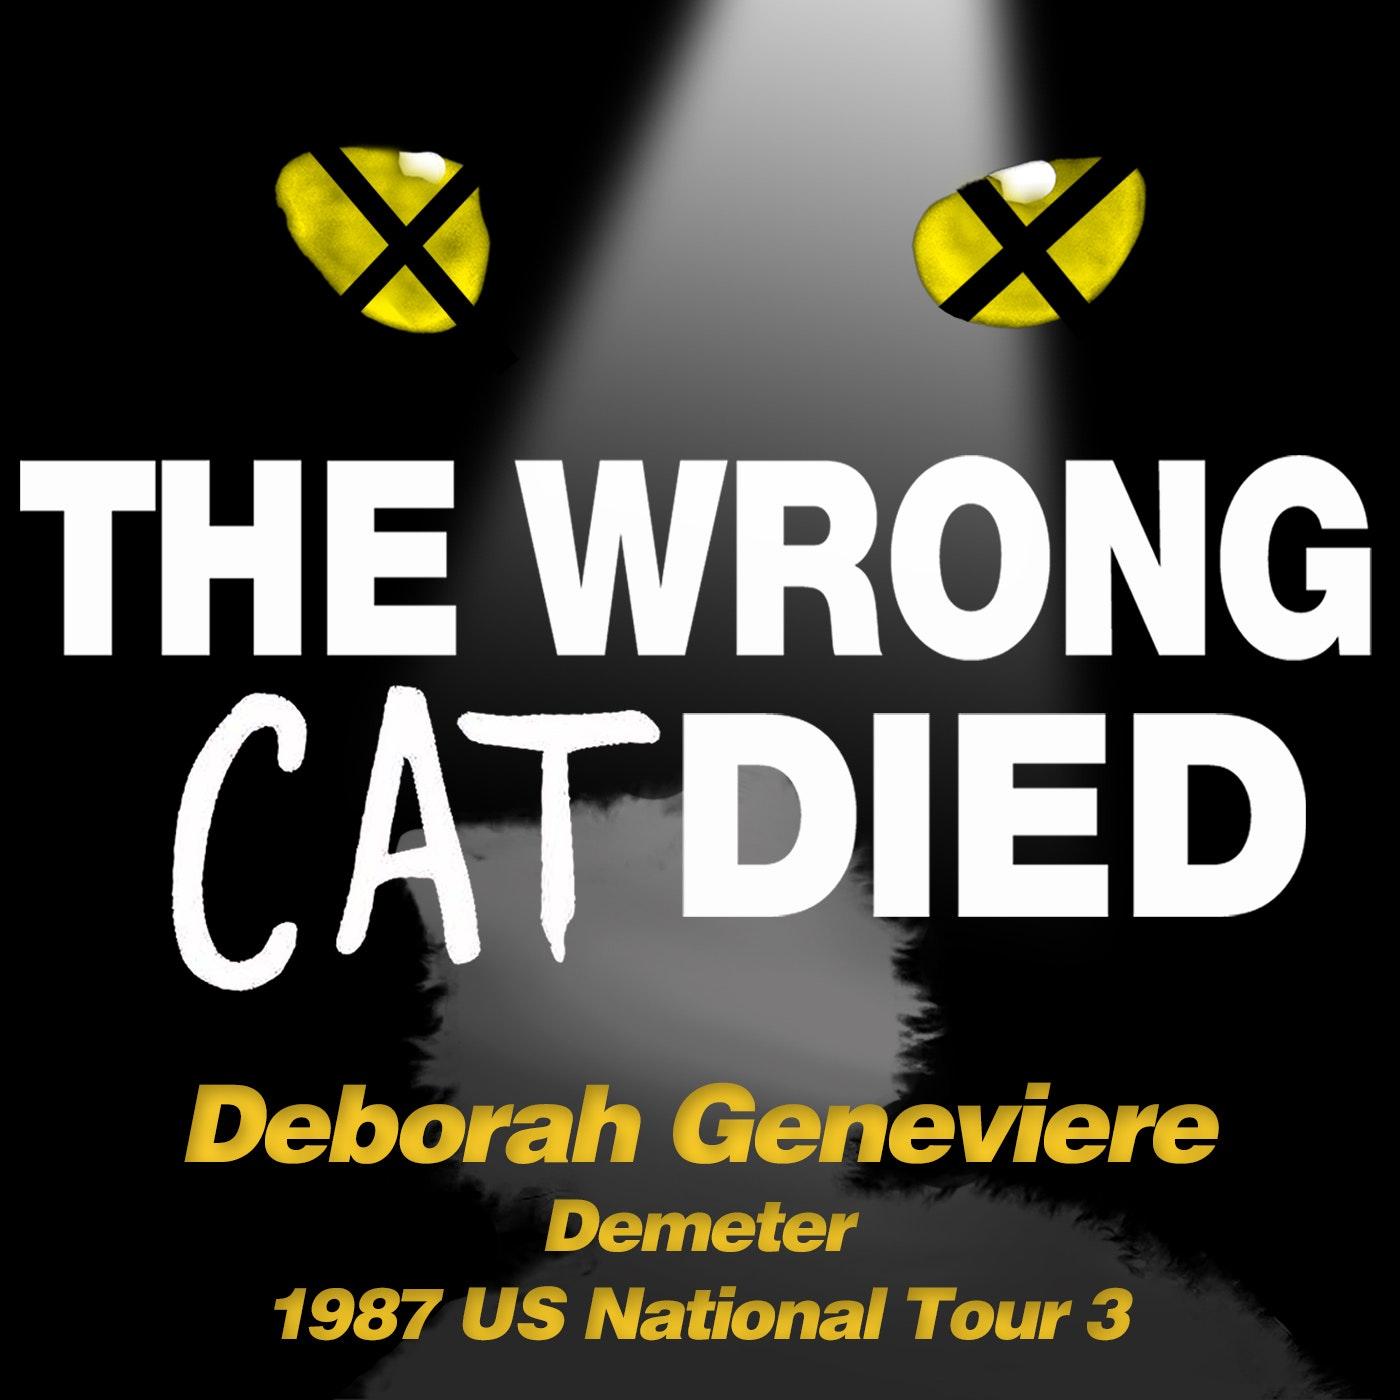 Ep38 - Deborah Geneviere, Demeter from 1987 US National Tour 3